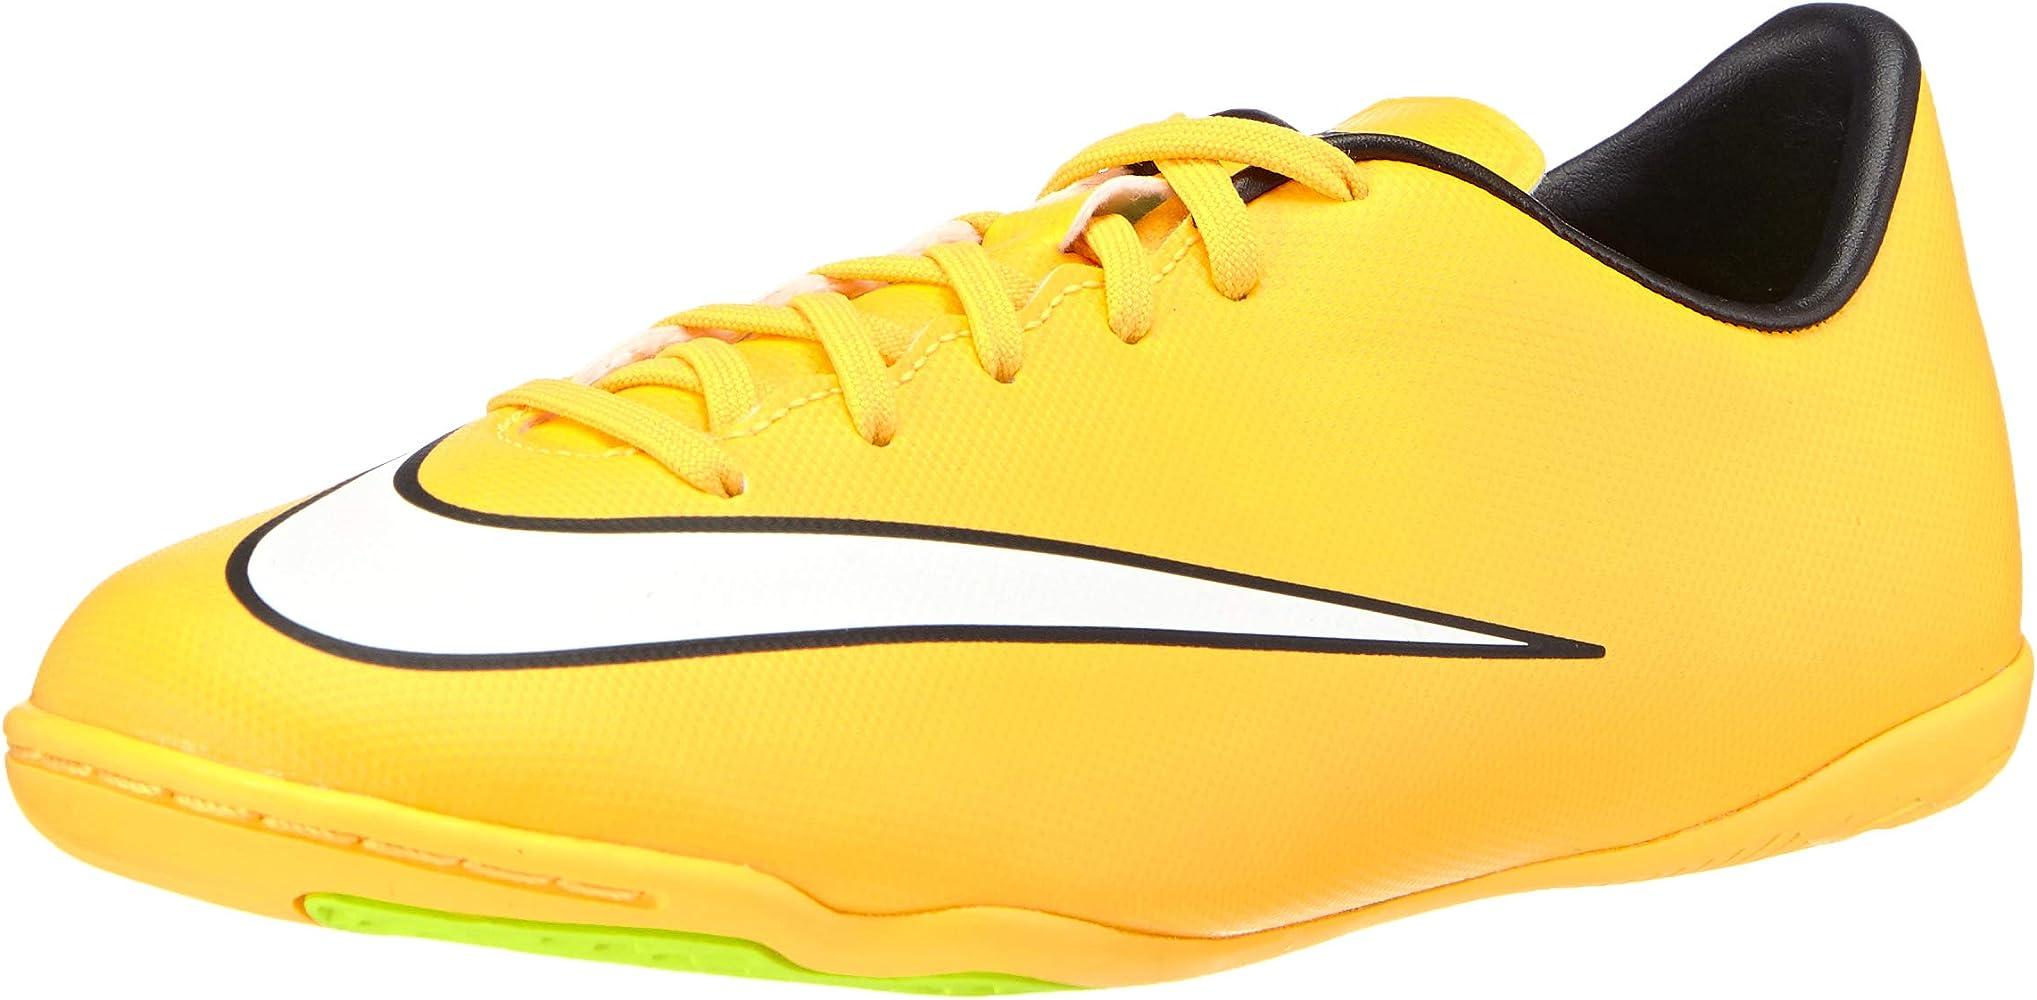 Pase para saber Optimismo Prosperar  Amazon.com | Nike JR Mercurial Victory V IC Indoor Boys Shoes (11C) | Soccer